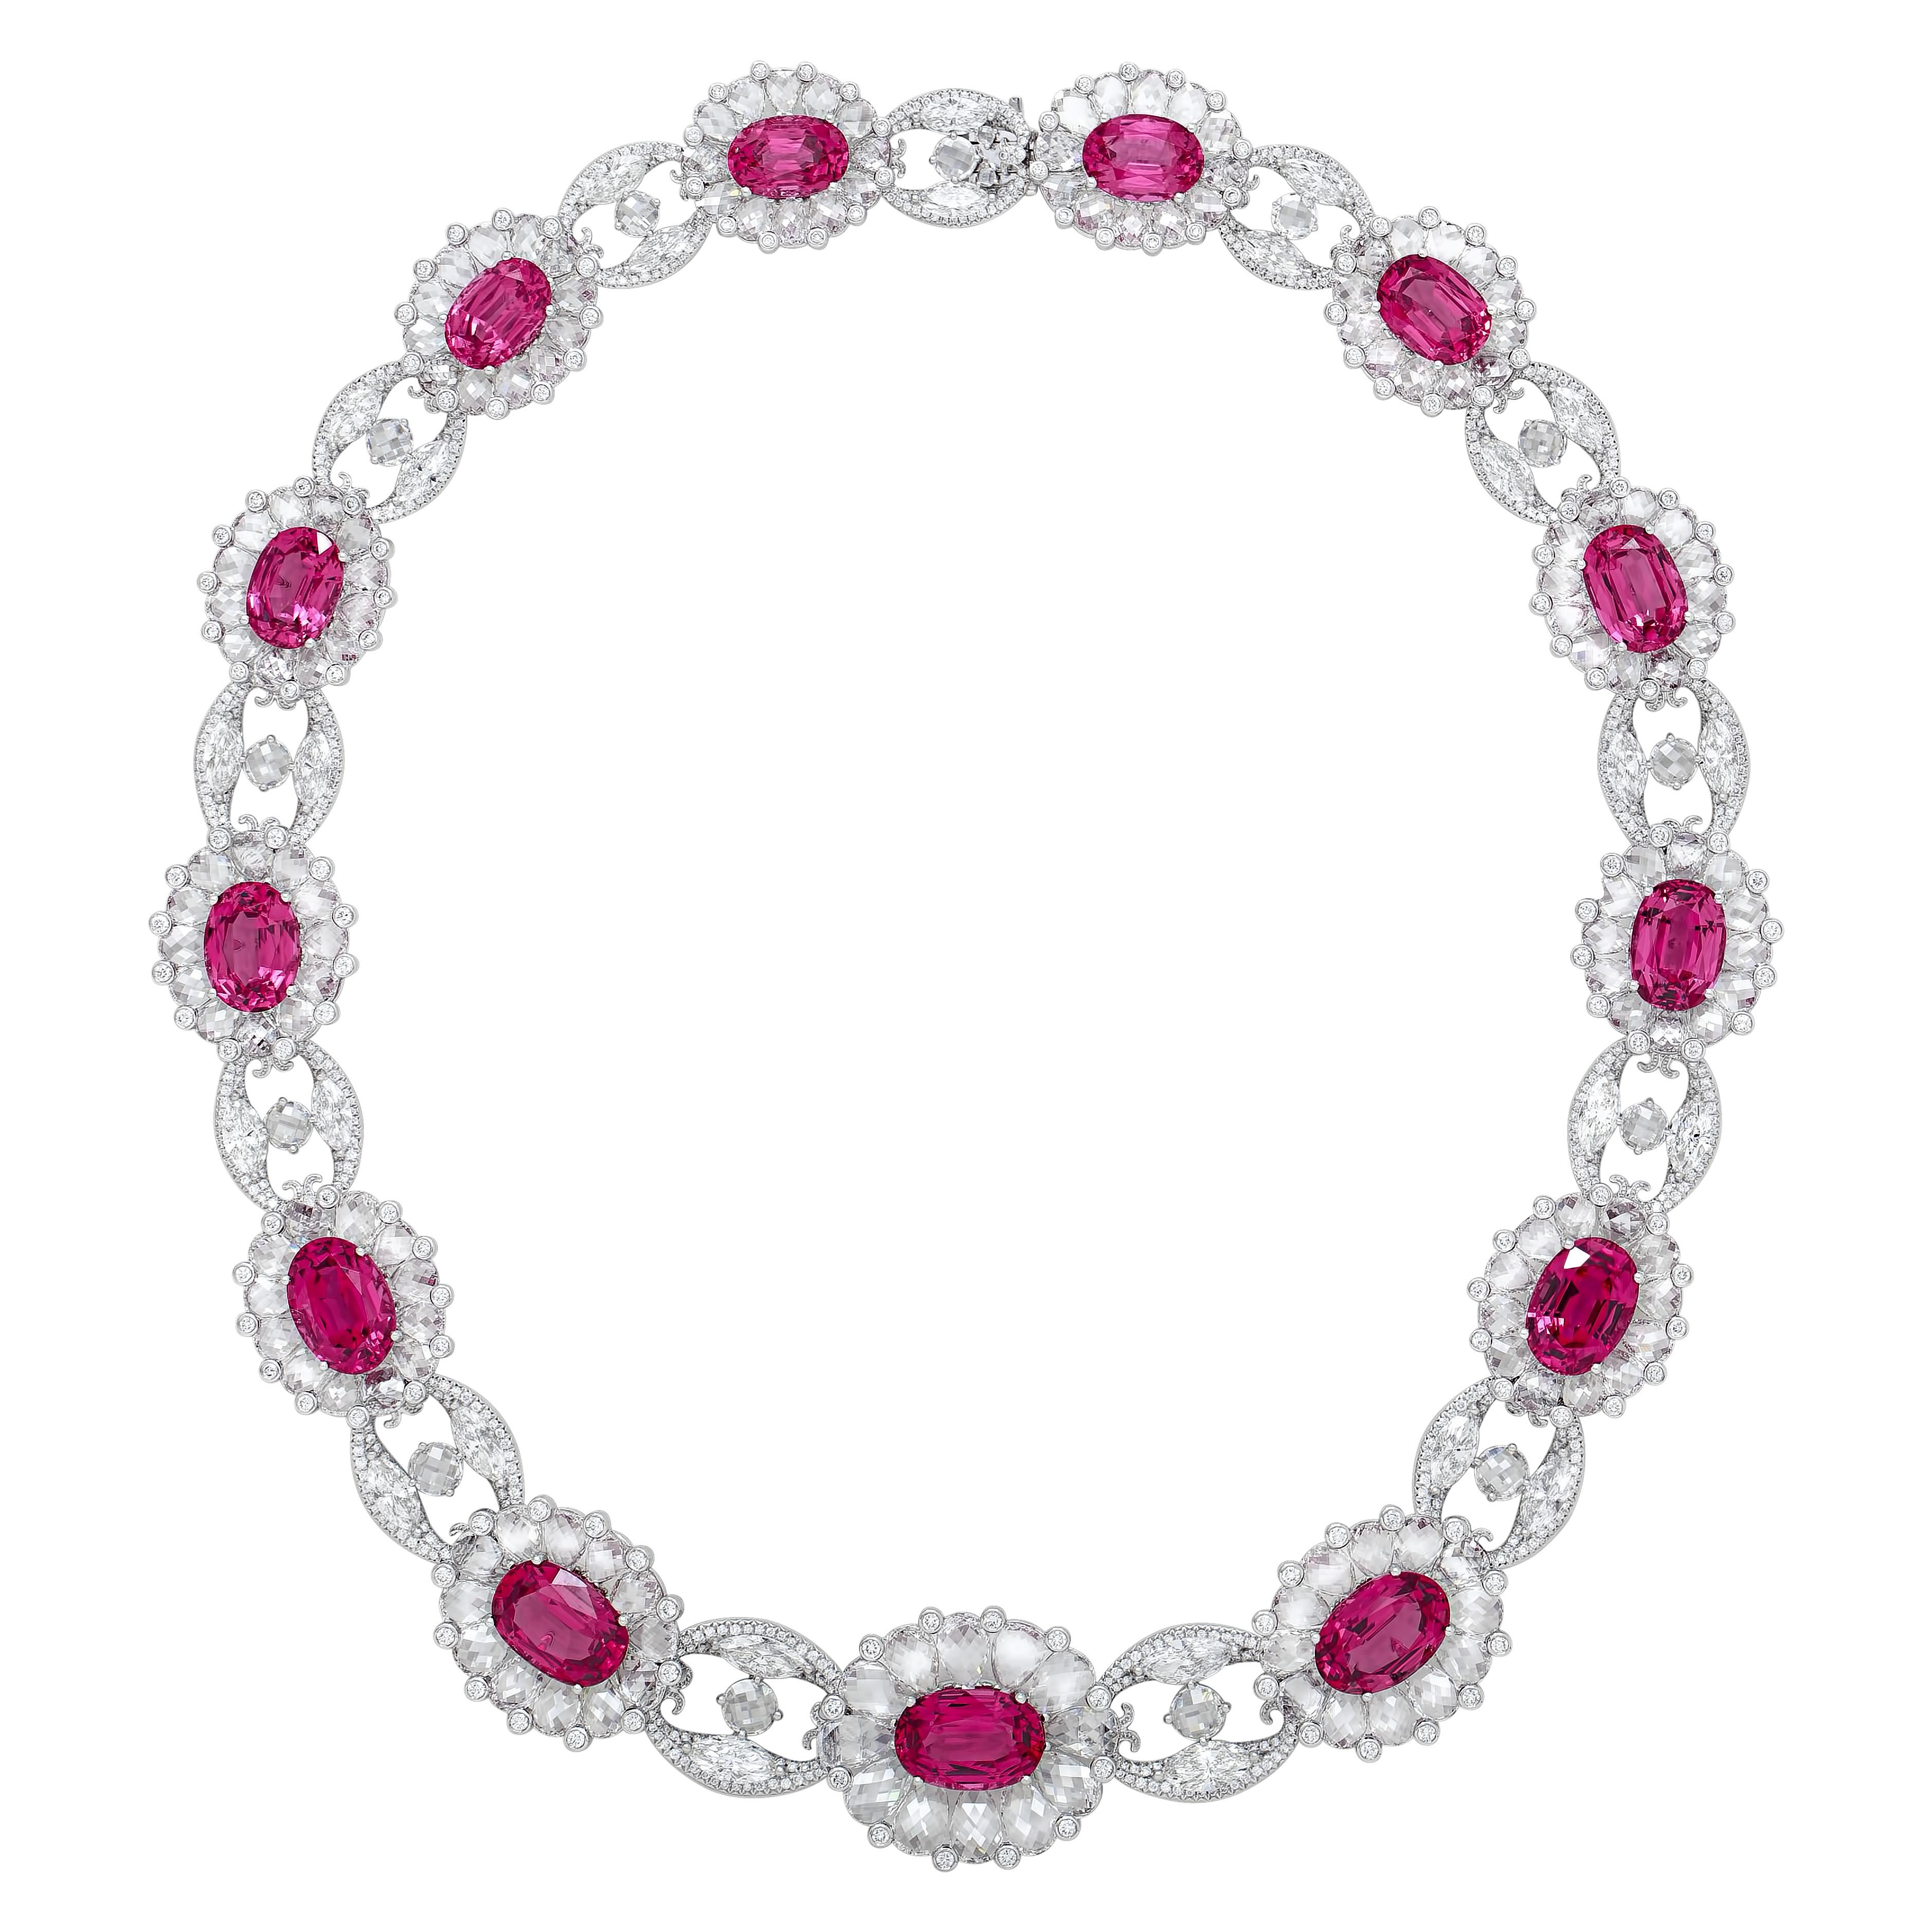 SPINEL-Spinel-Bloom-Necklace-by-Nirav-Modi